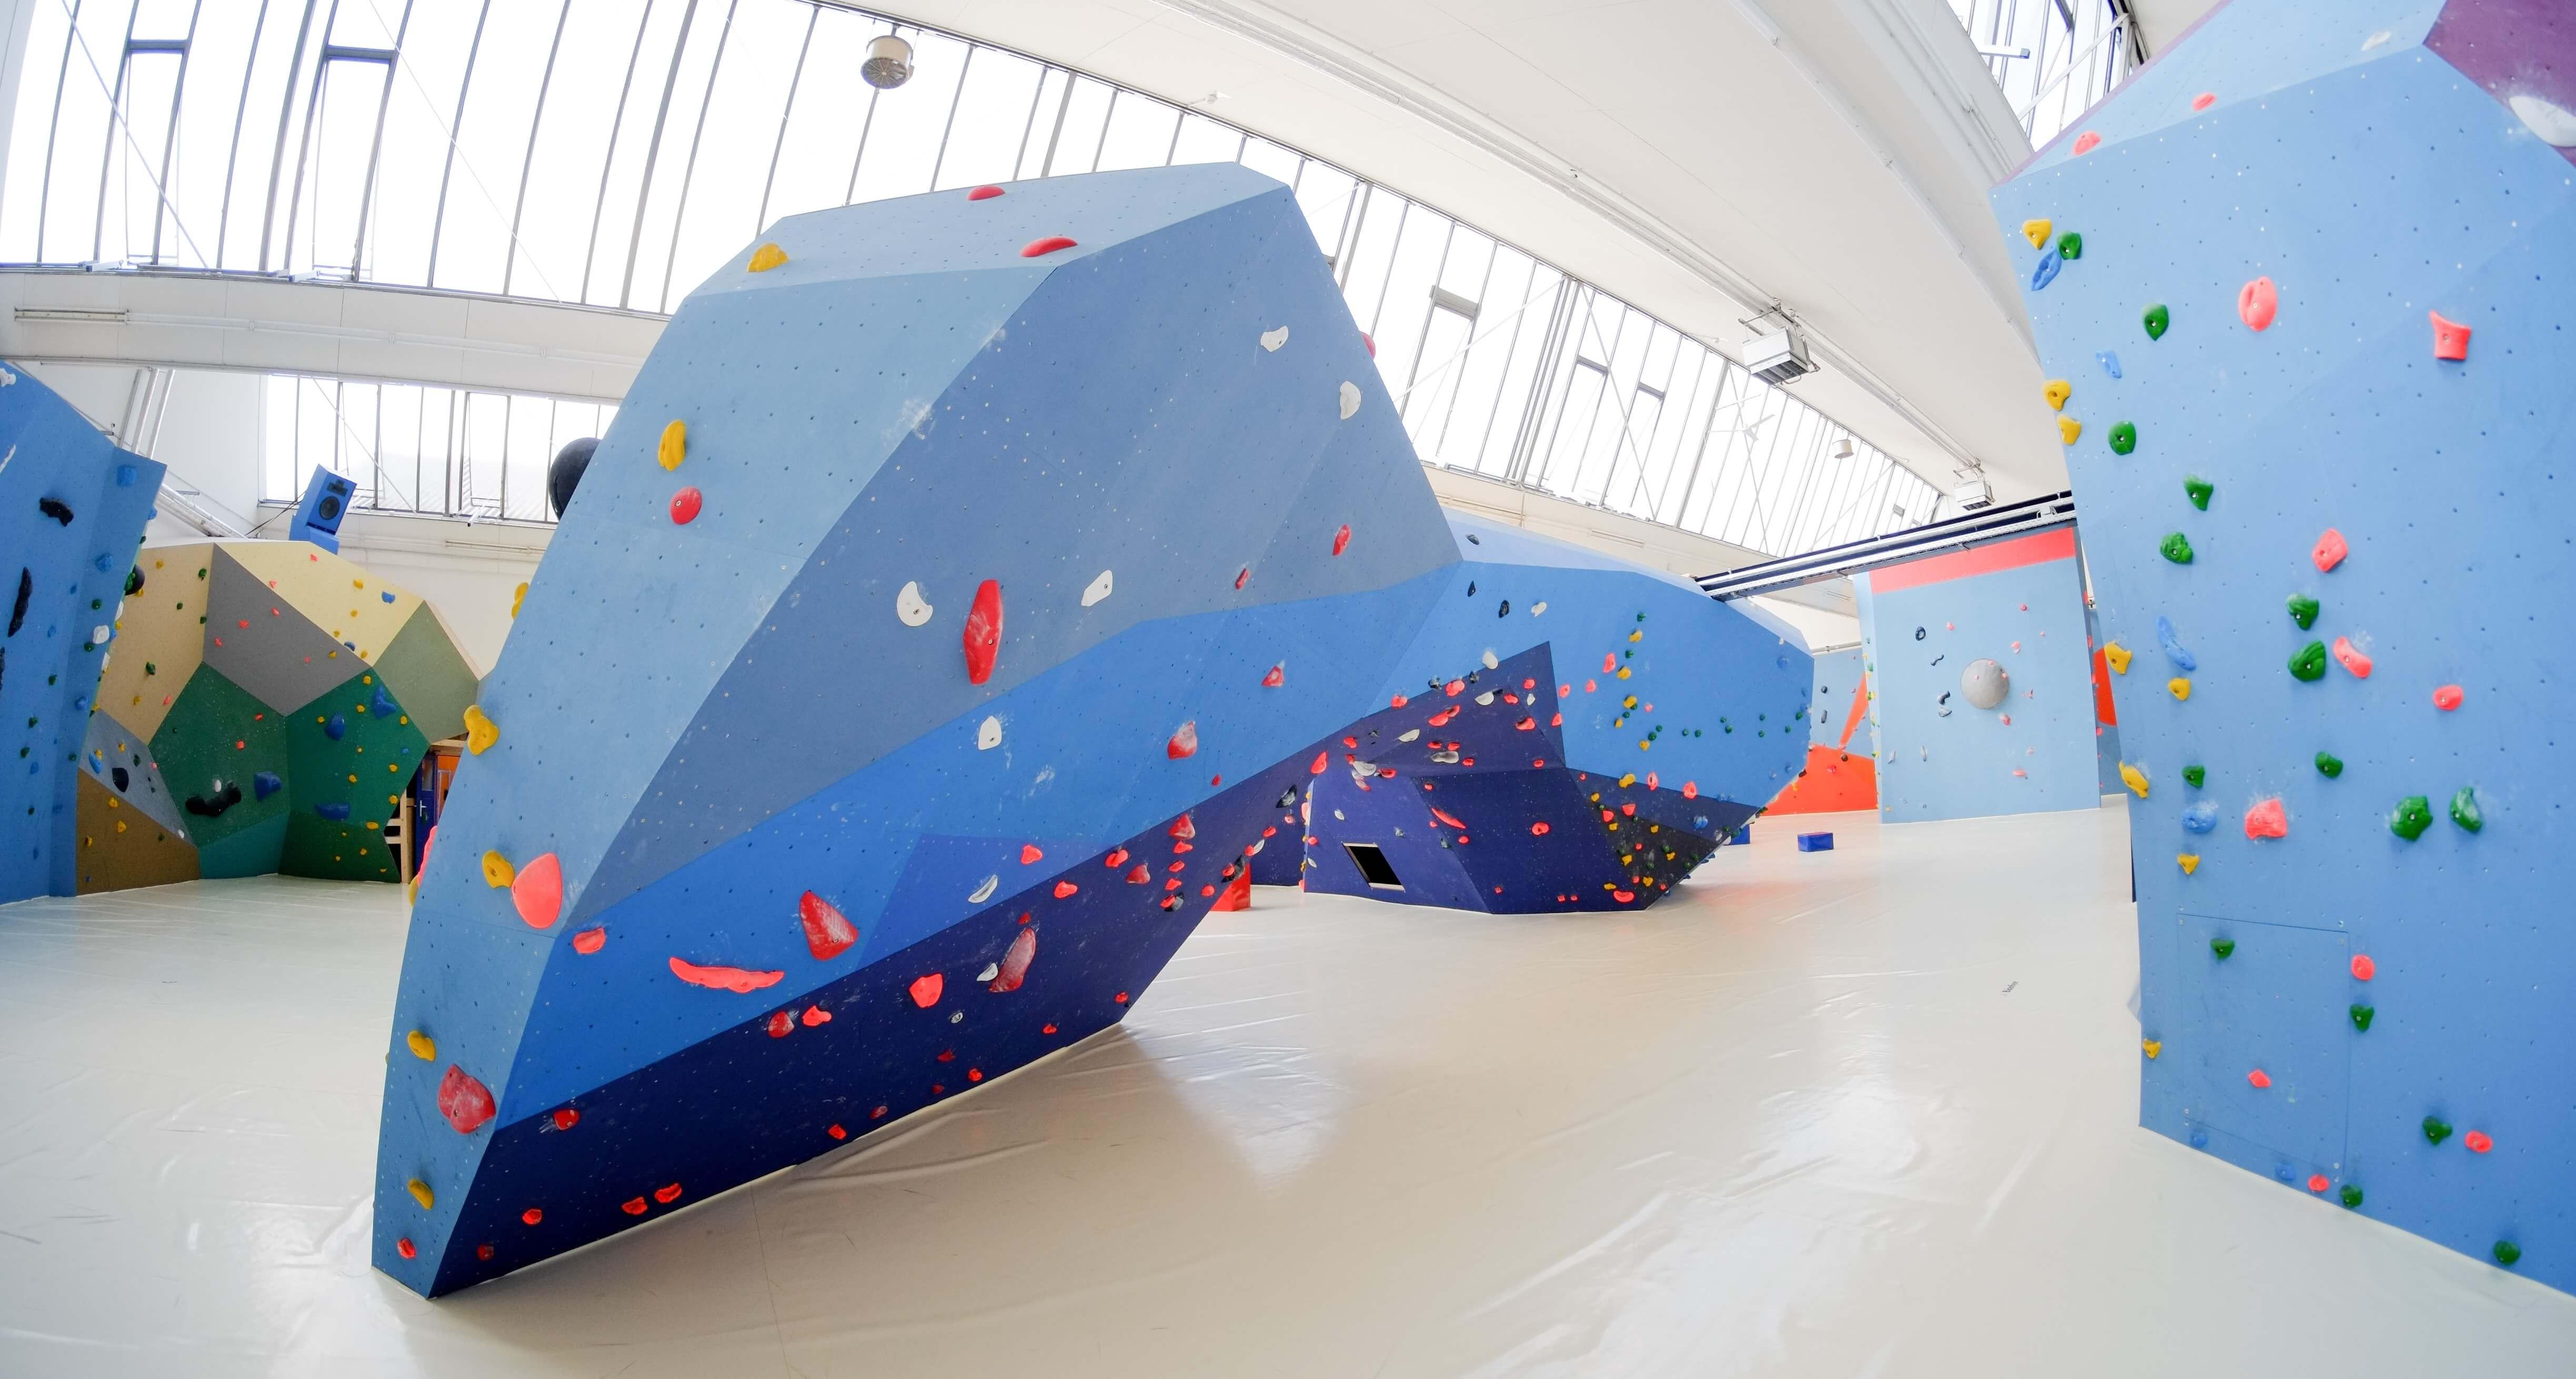 Top Boulderhalle - Boulderhalle Boulderplanet Köln